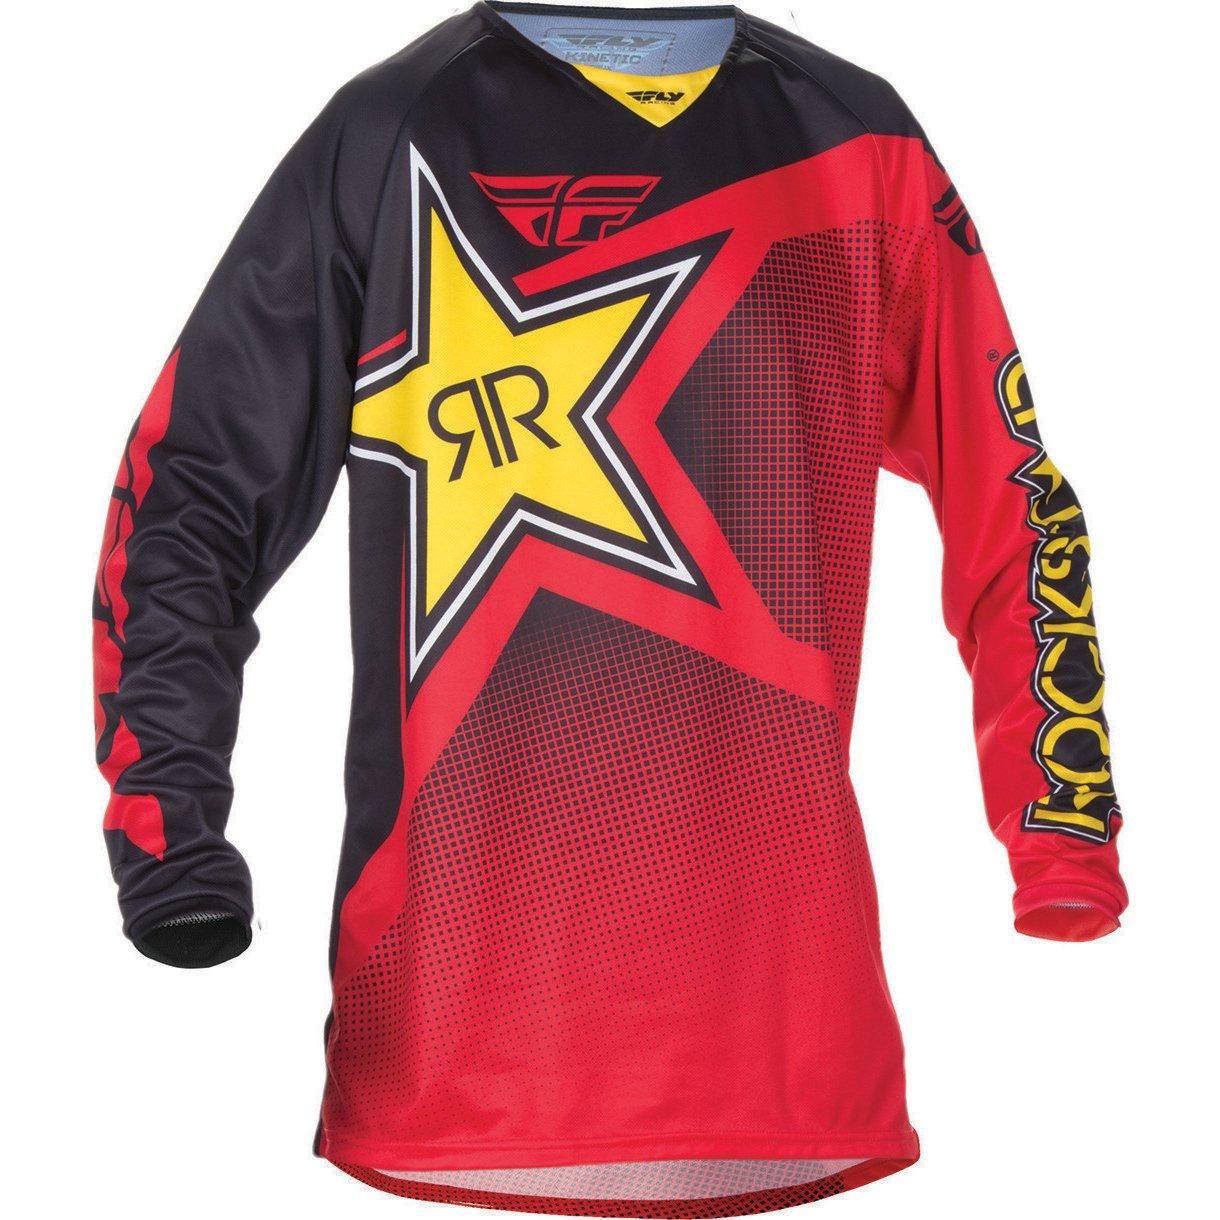 Fly Racing Mountainbike /& Motocross Mesh Hemd blau-wei/ß-orange Fahrerhemd